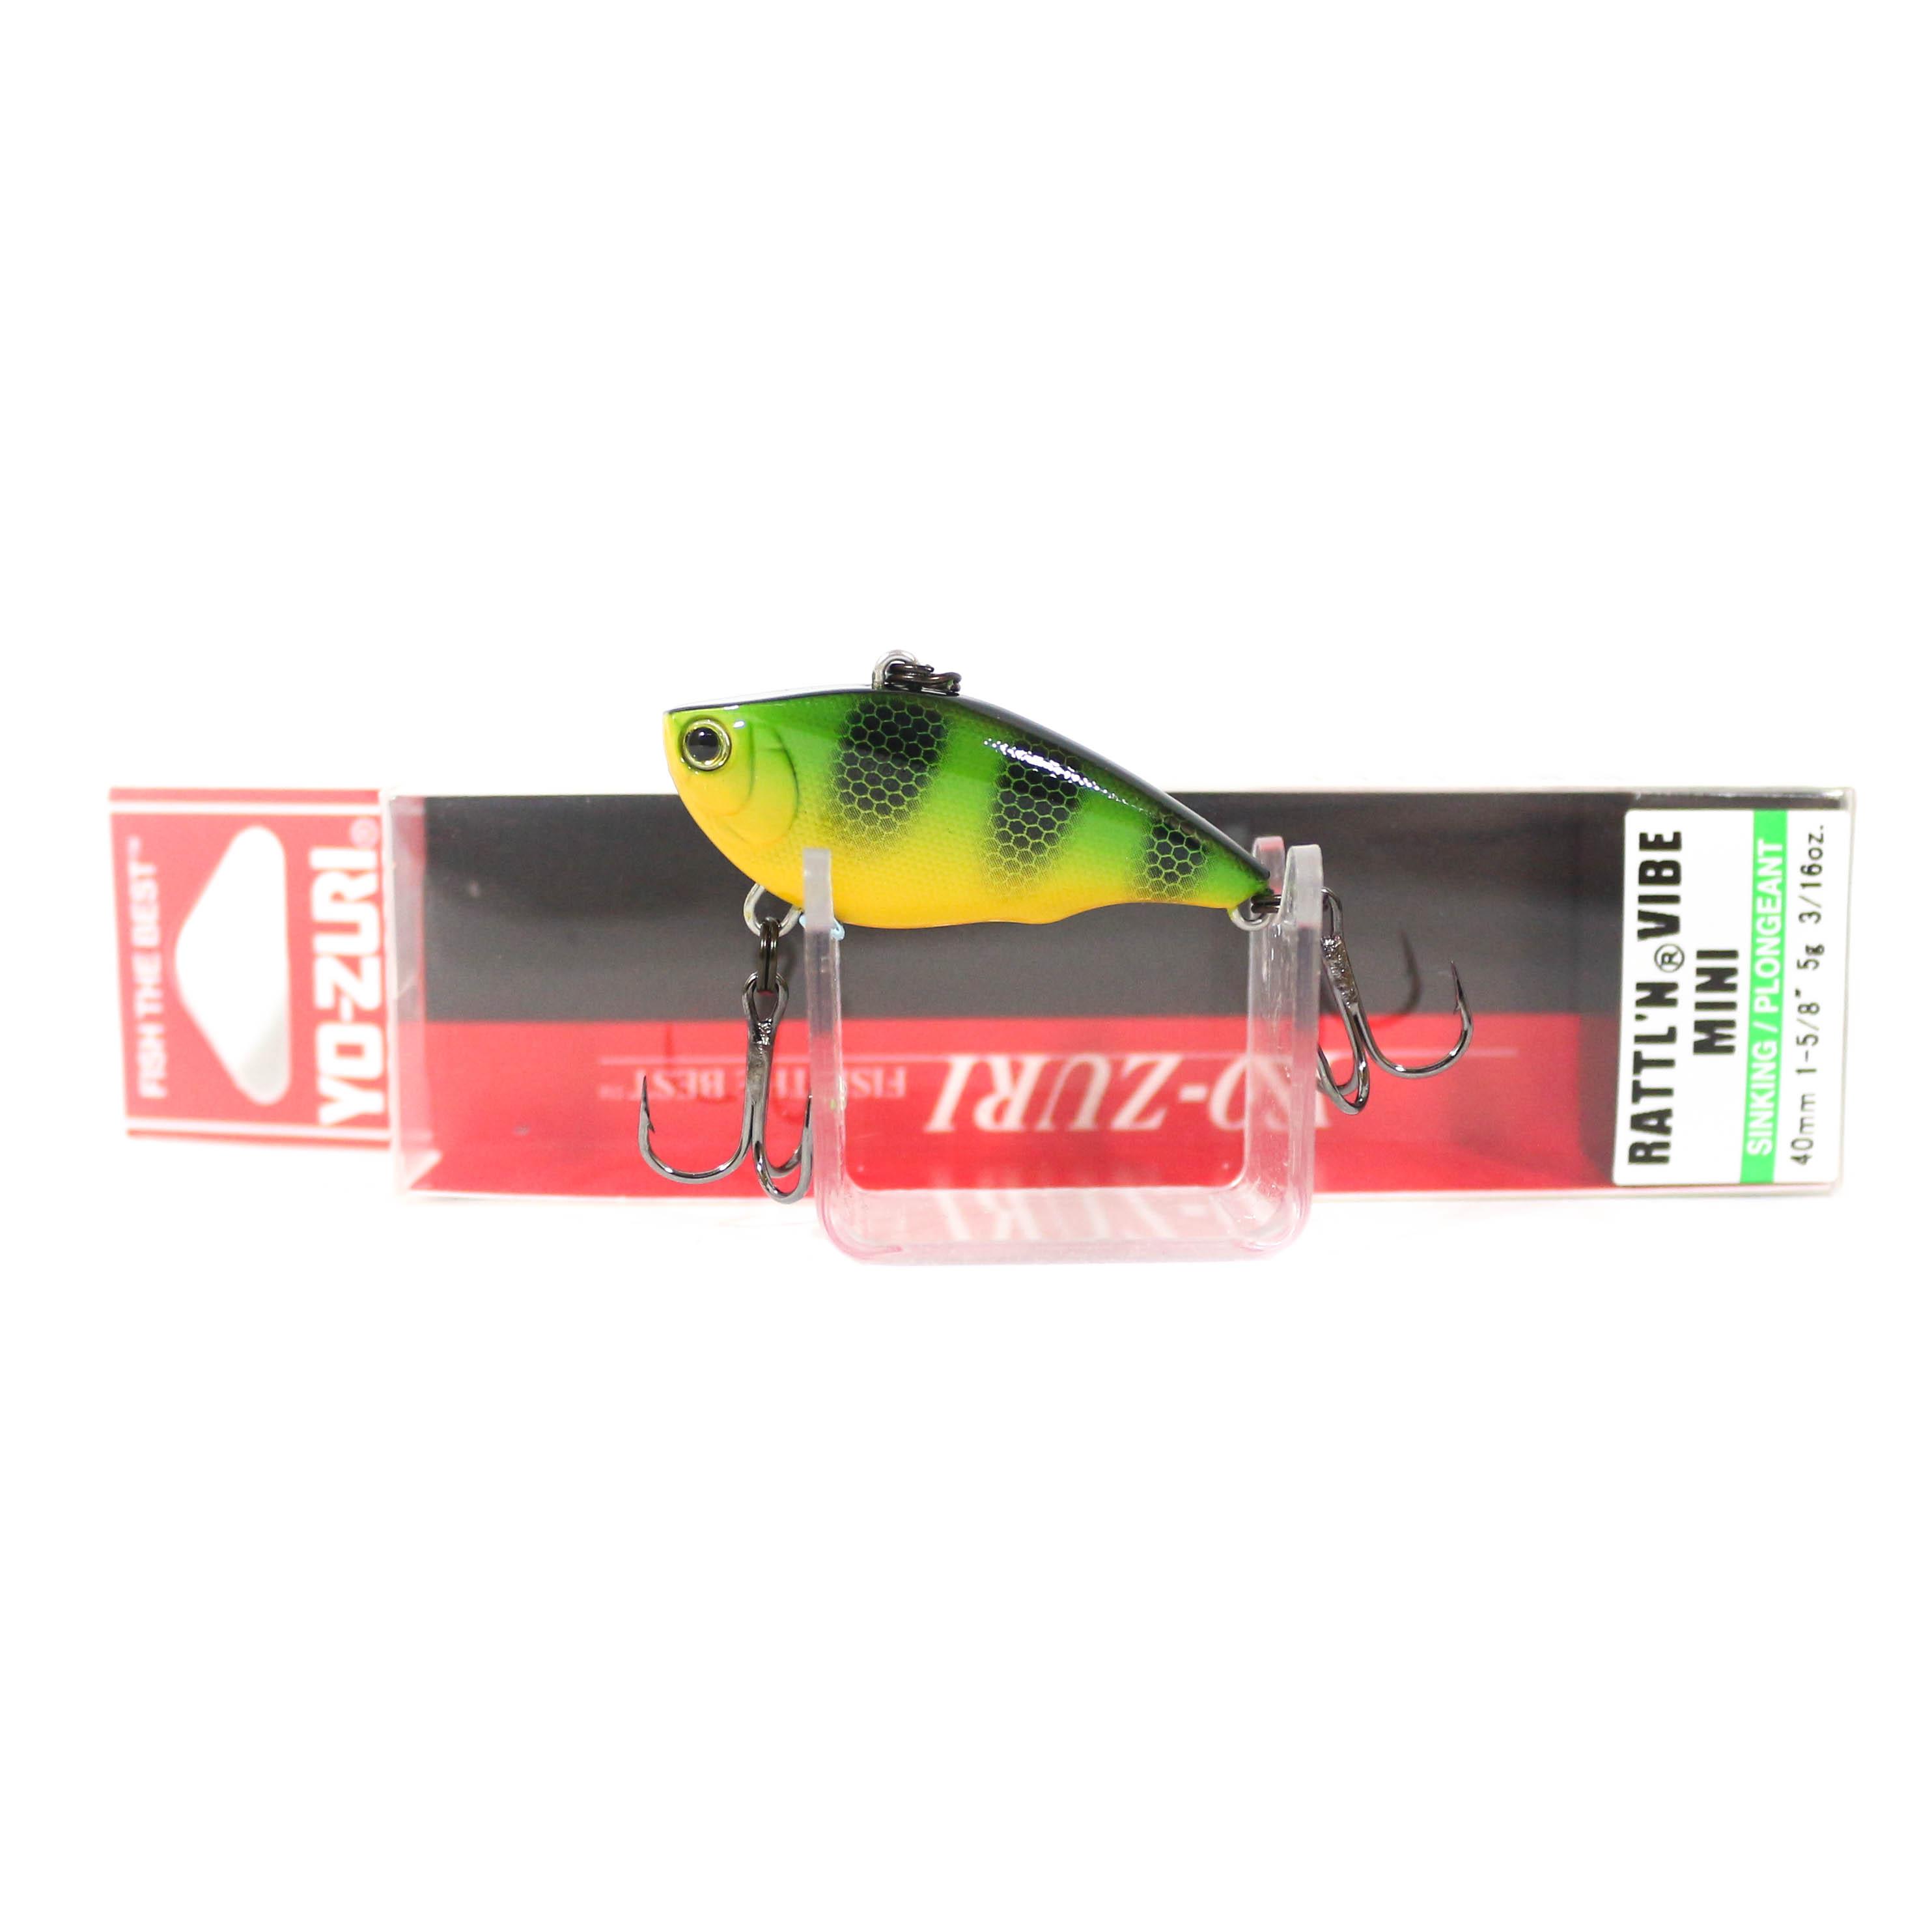 Details about  /Yo Zuri Rattl/'n Vibe Mini 40 mm Vibration Sinking Lure R1354-UPT 0683